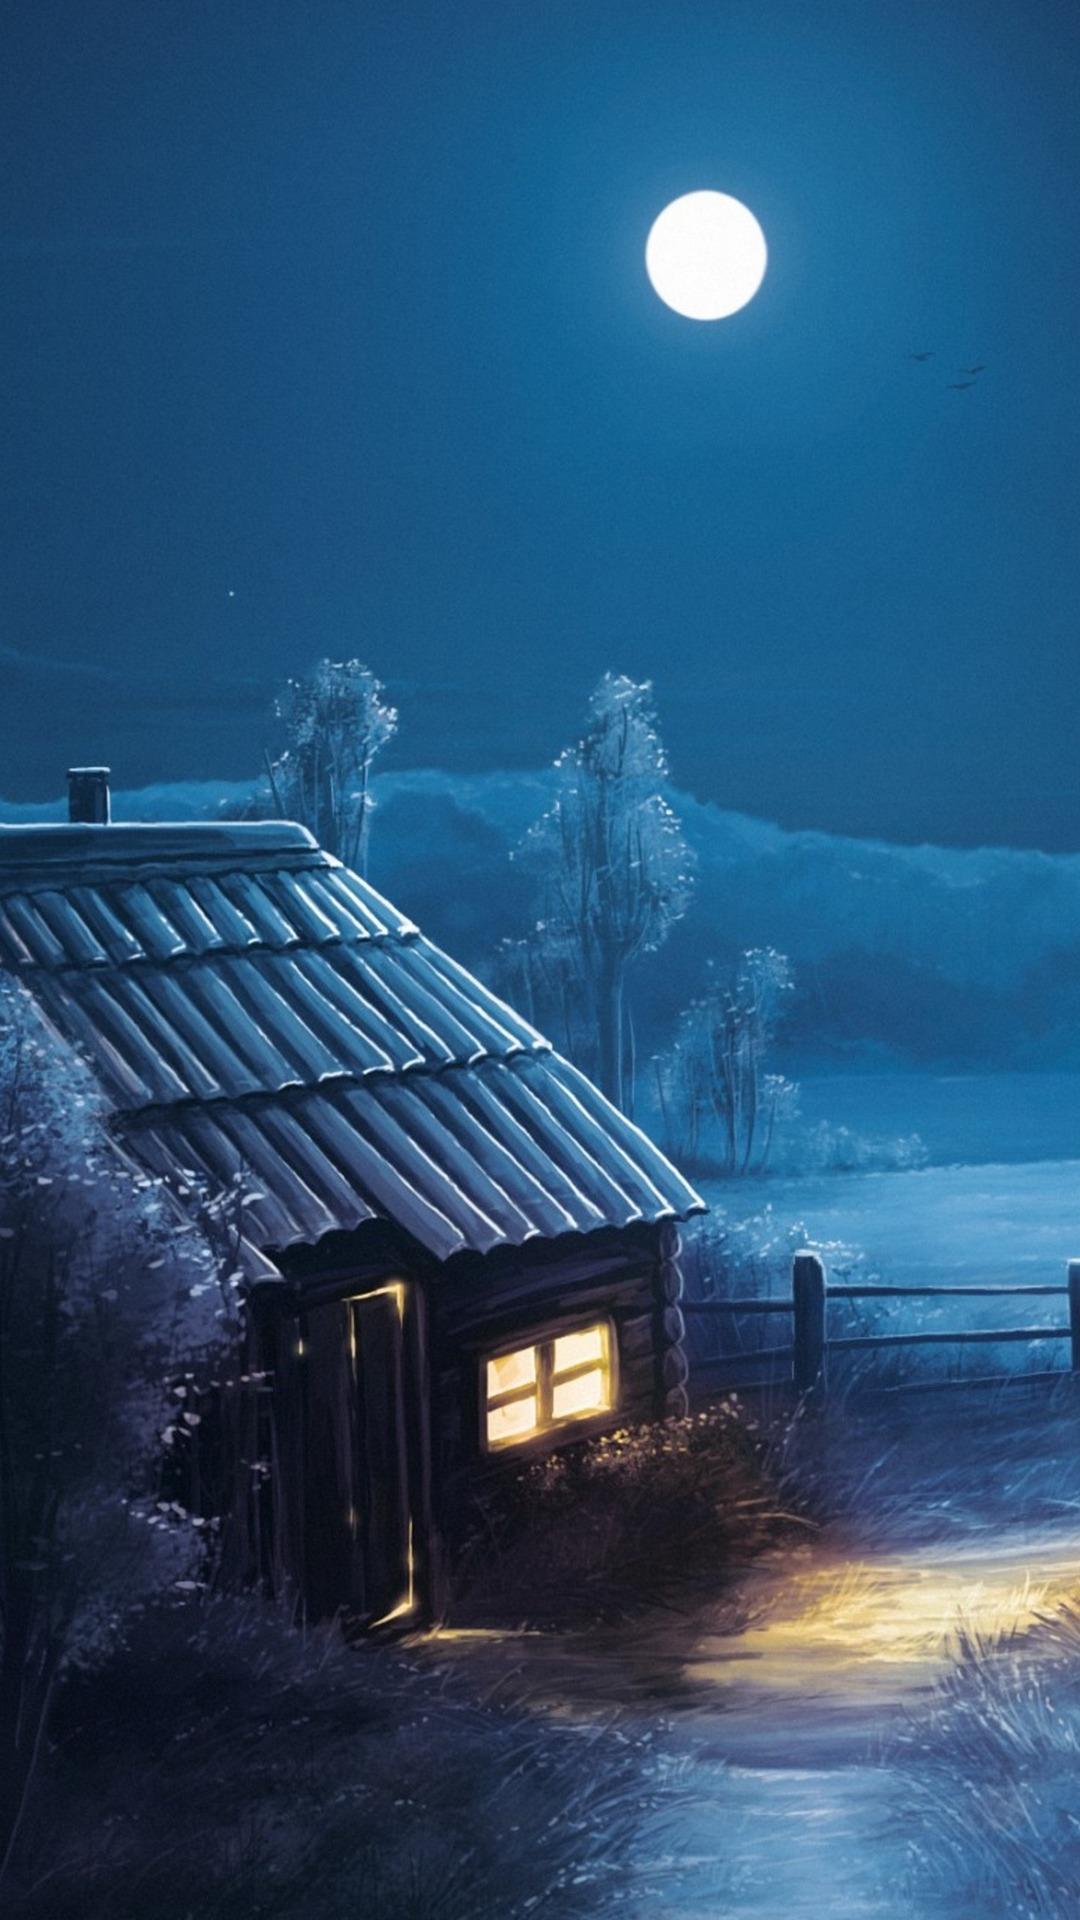 Background Hd Wallpaper Beautiful Wallpaper Good Night 1080x1920 Wallpaper Teahub Io